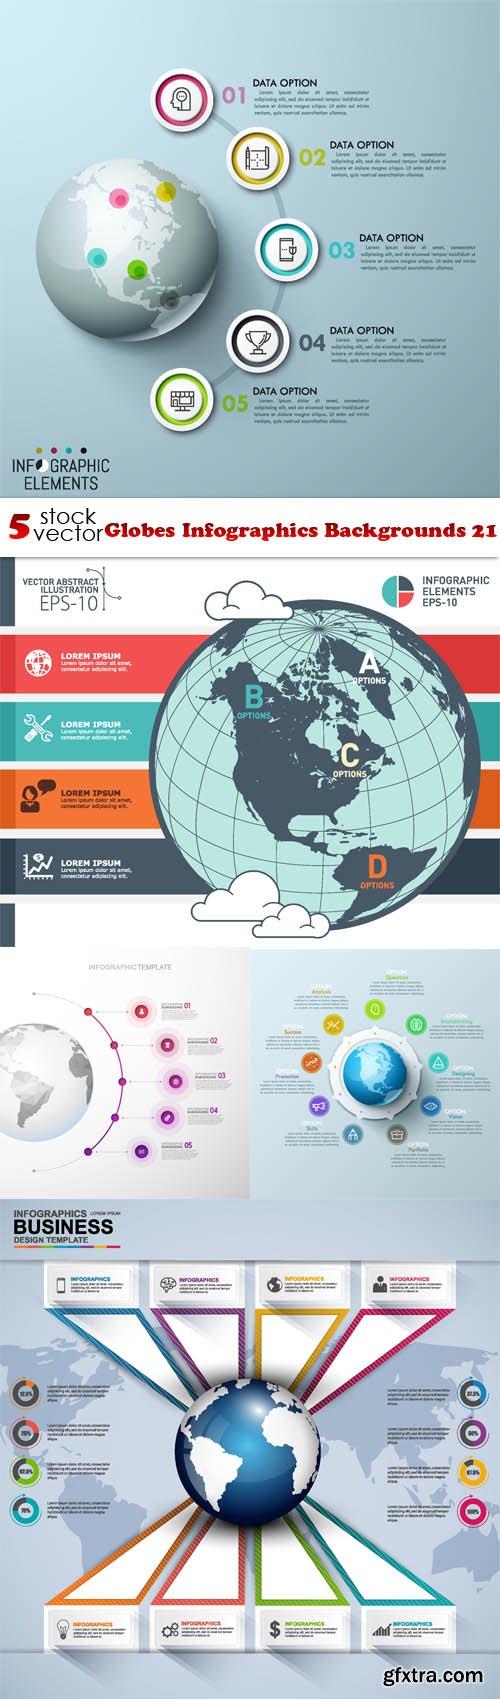 Vectors - Globes Infographics Backgrounds 21